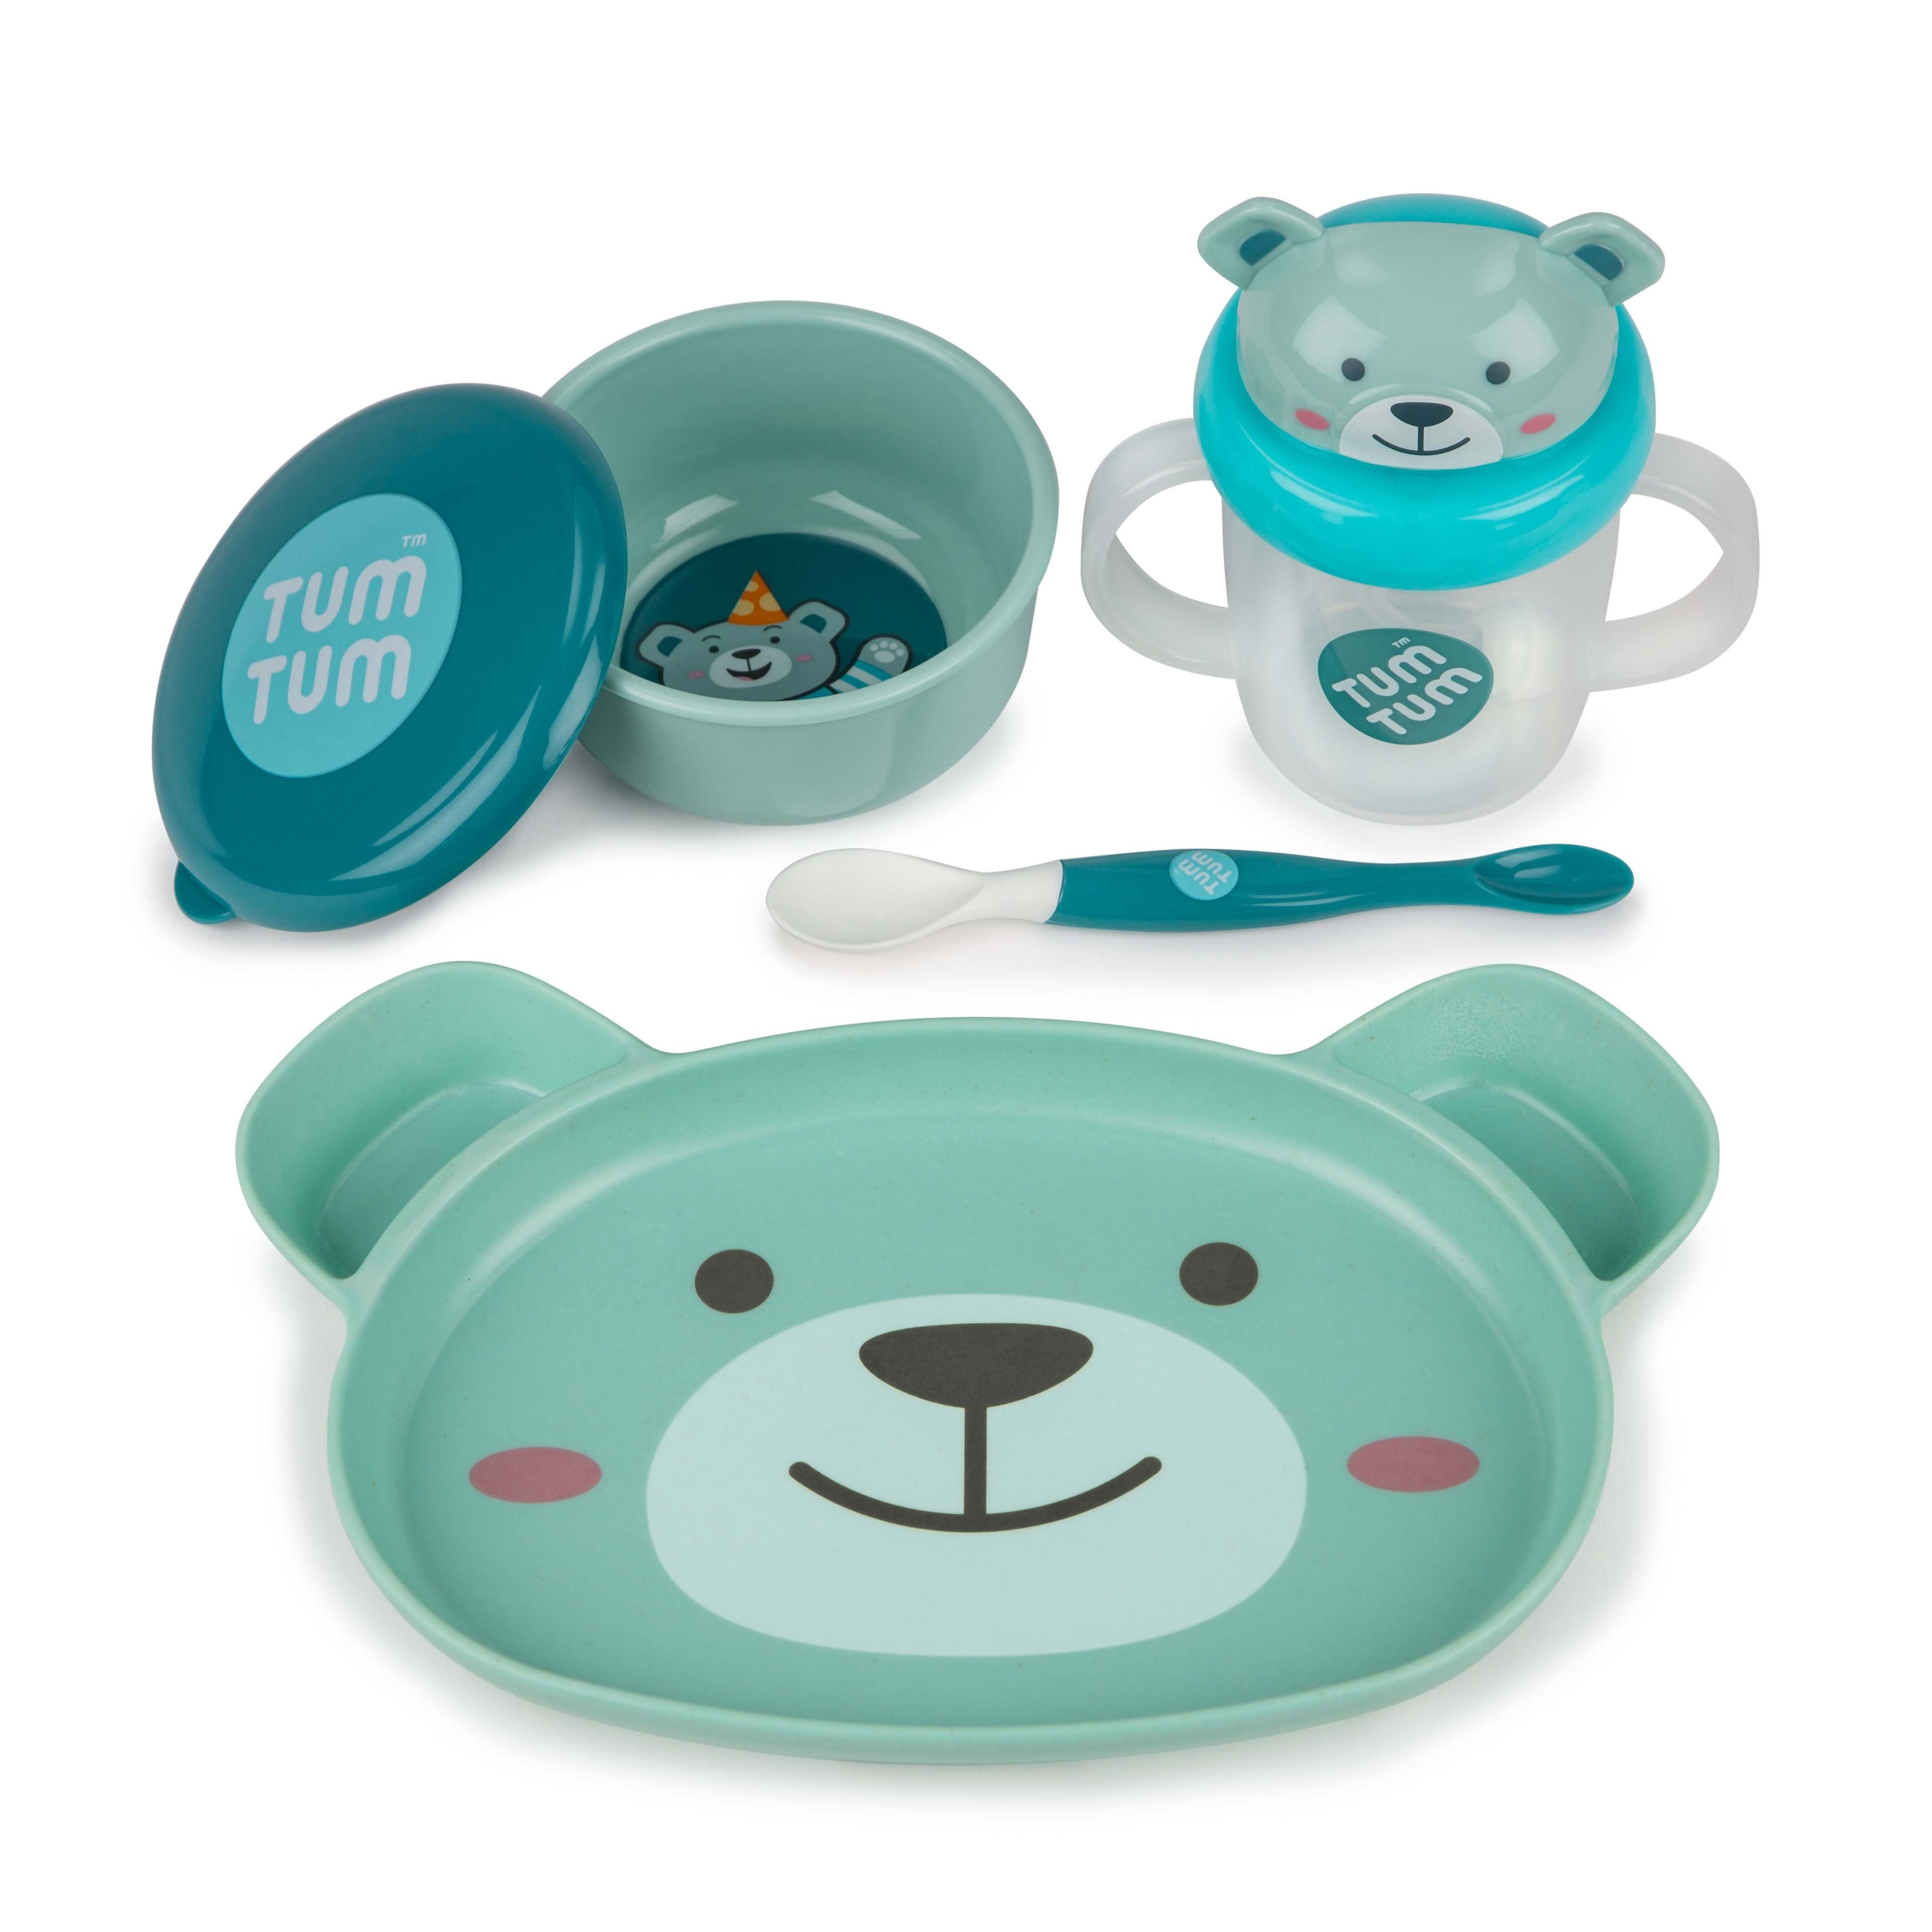 Tum Tum Boris Bear Baby Weaning Set - 4 pieces BPA Free